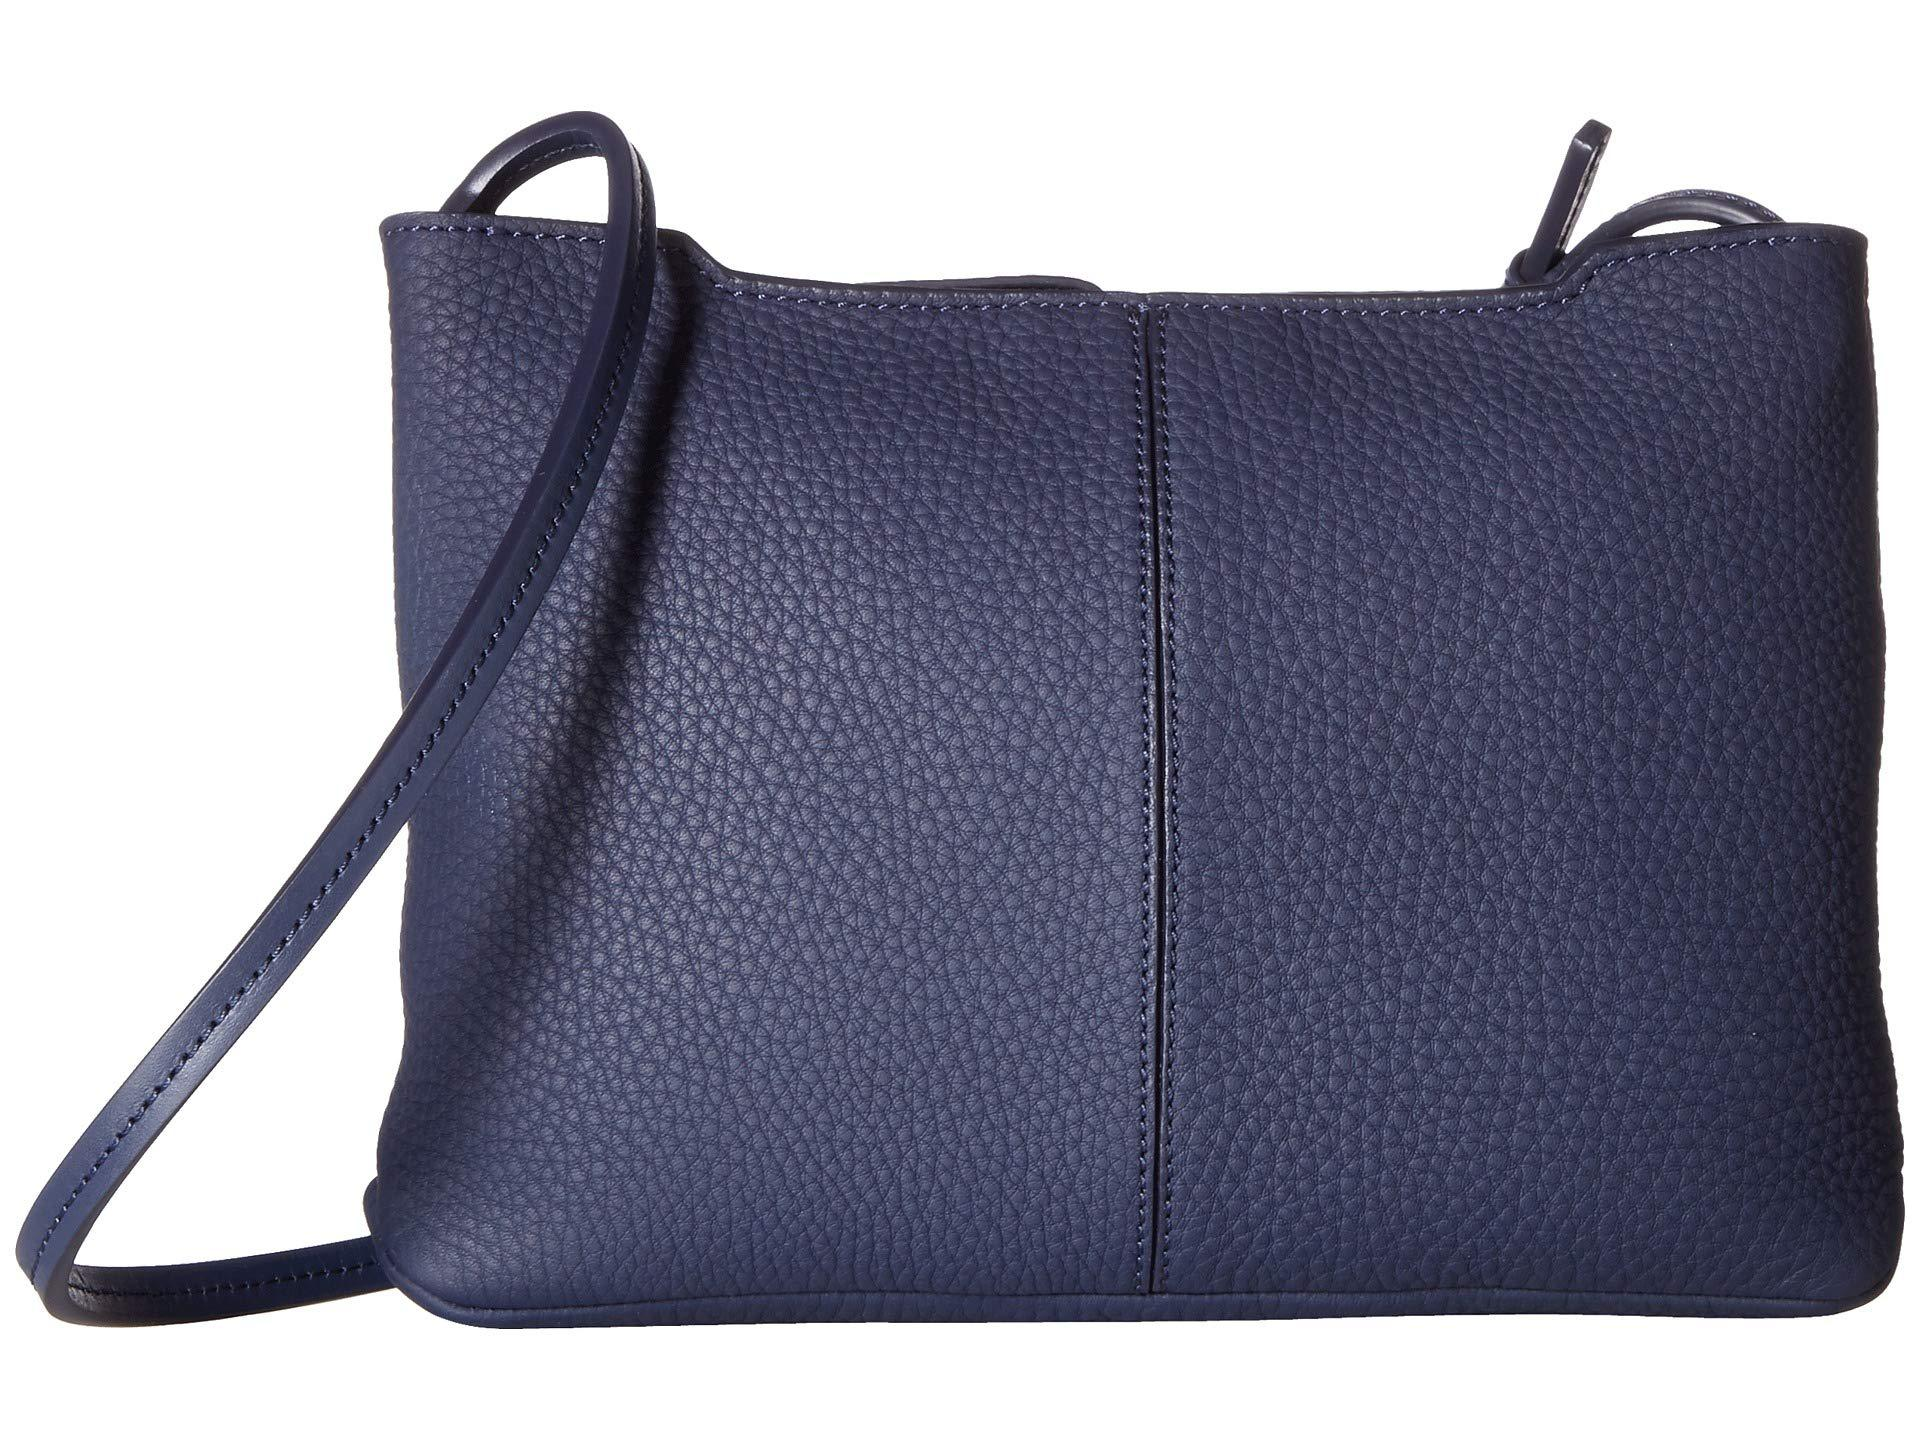 8626a70d38c4 Lyst - Ecco Jilin Small Crossbody (fired Brick) Cross Body Handbags ...